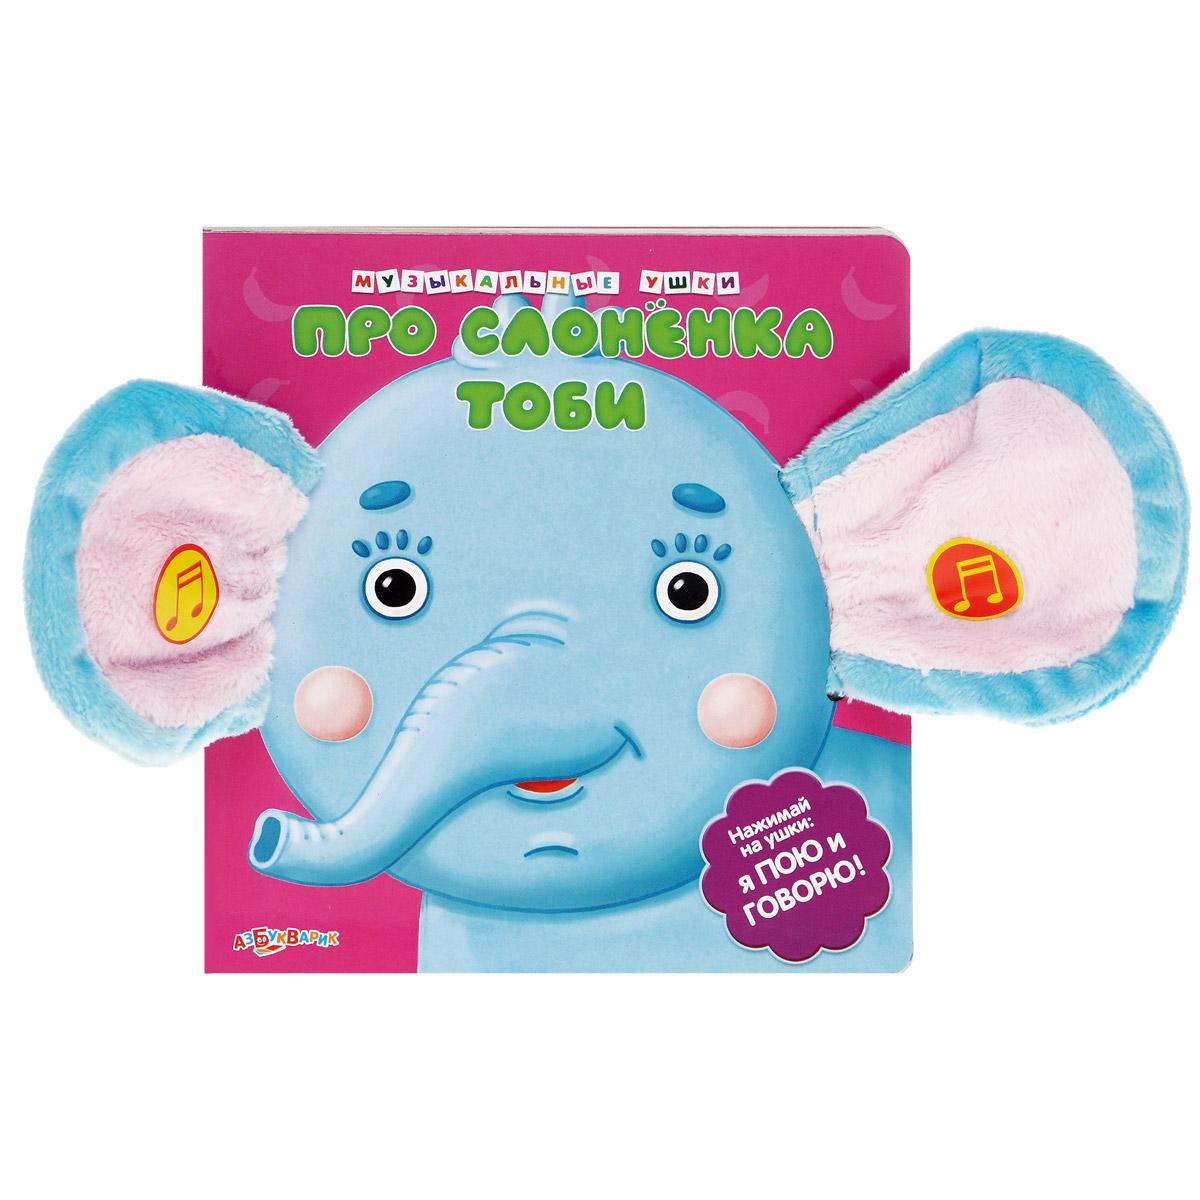 Про слоненка Тоби. Книжка-игрушка